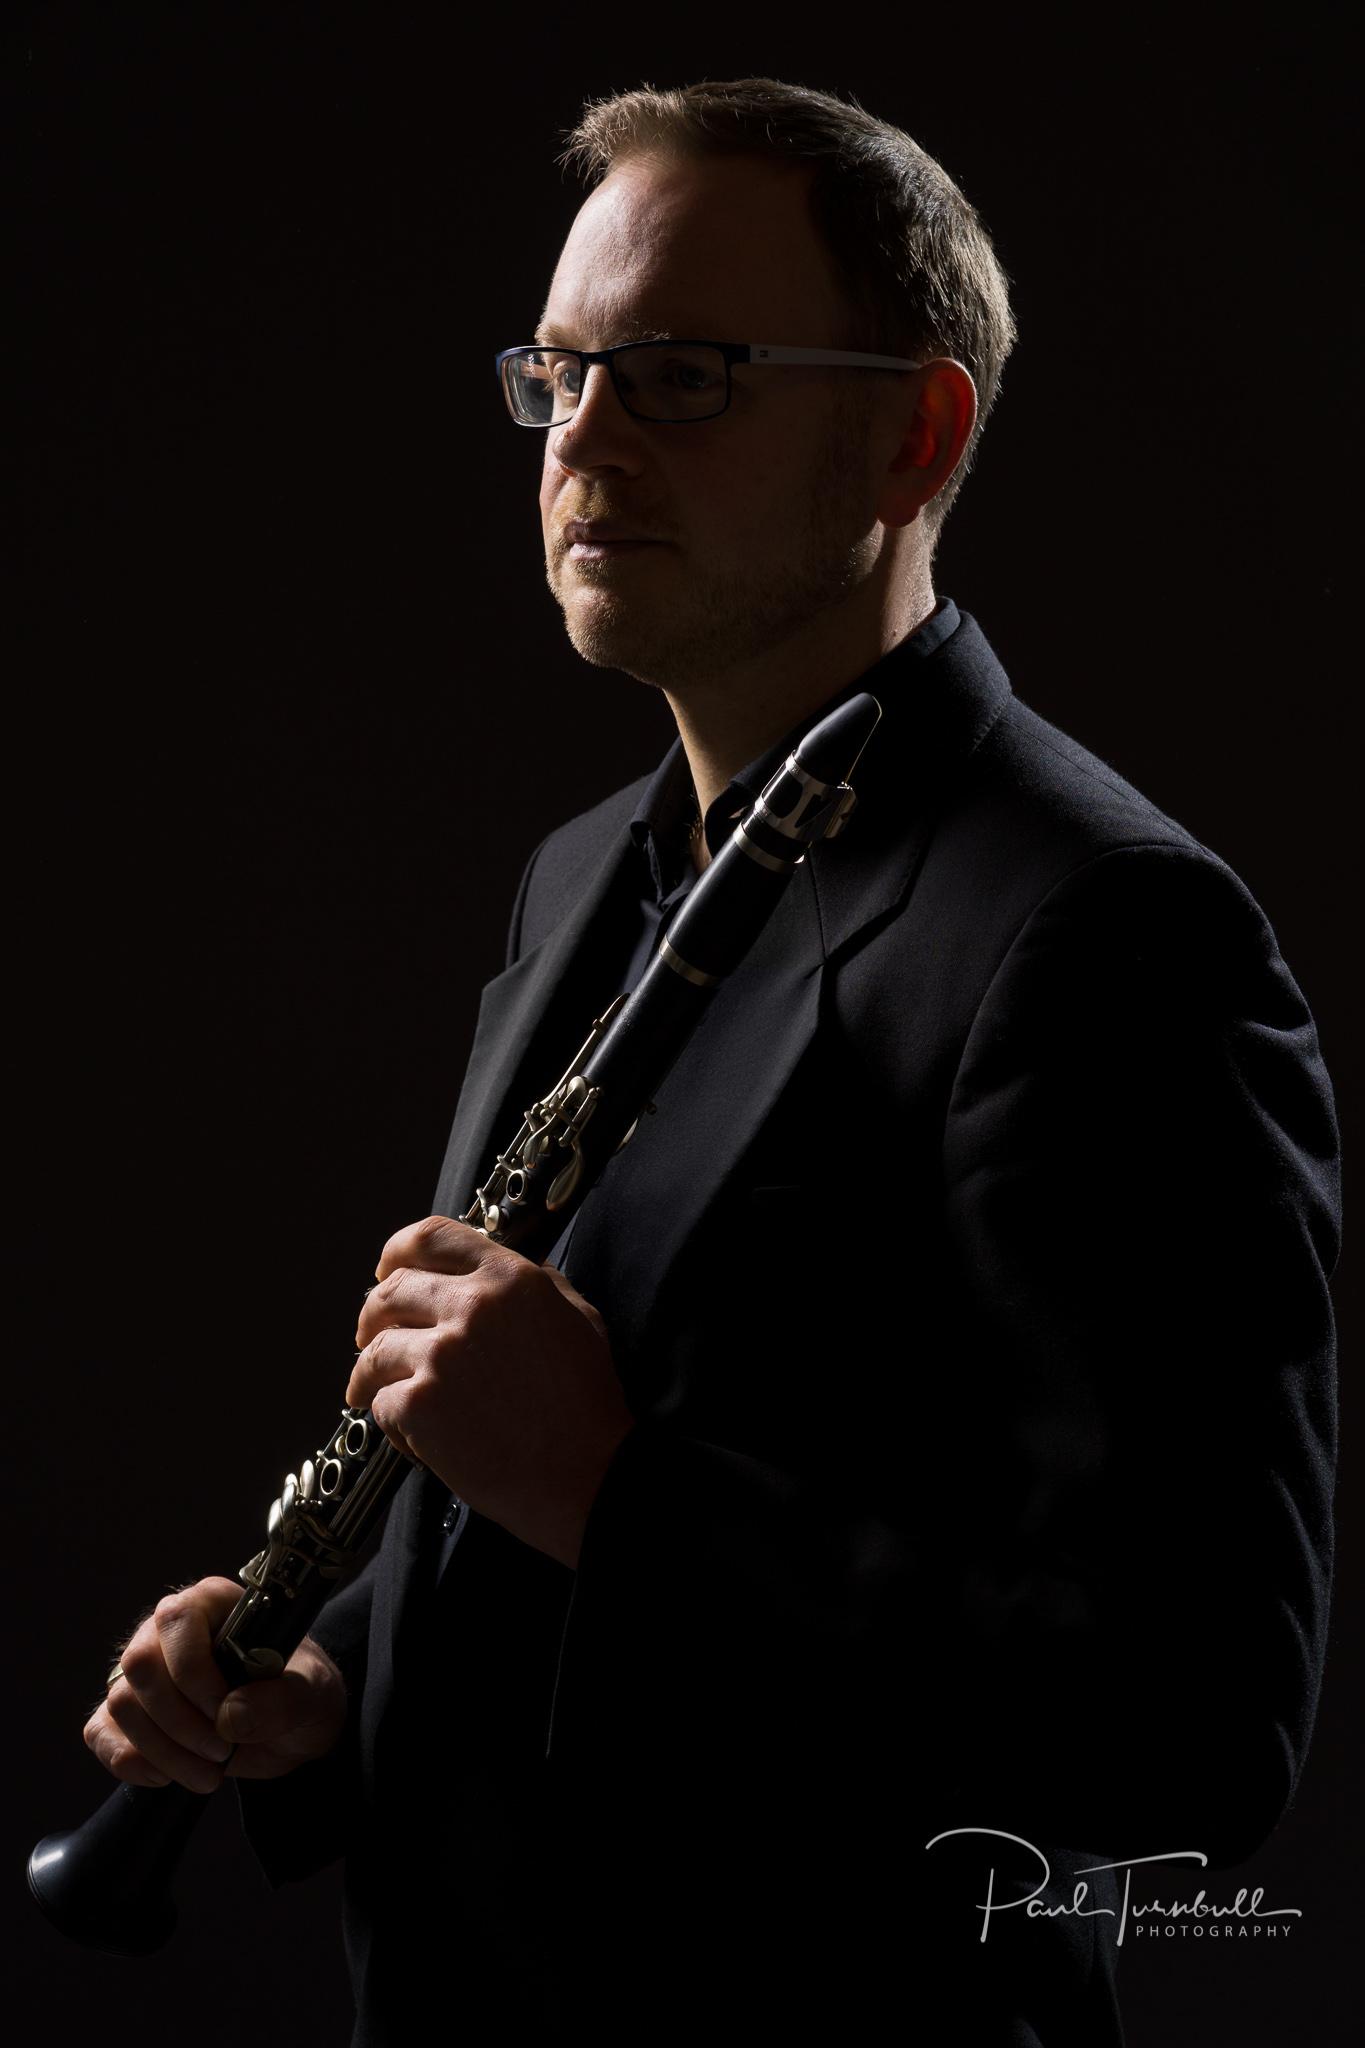 musician-headshot-portrait photographer-leeds-yorkshire-005.jpg